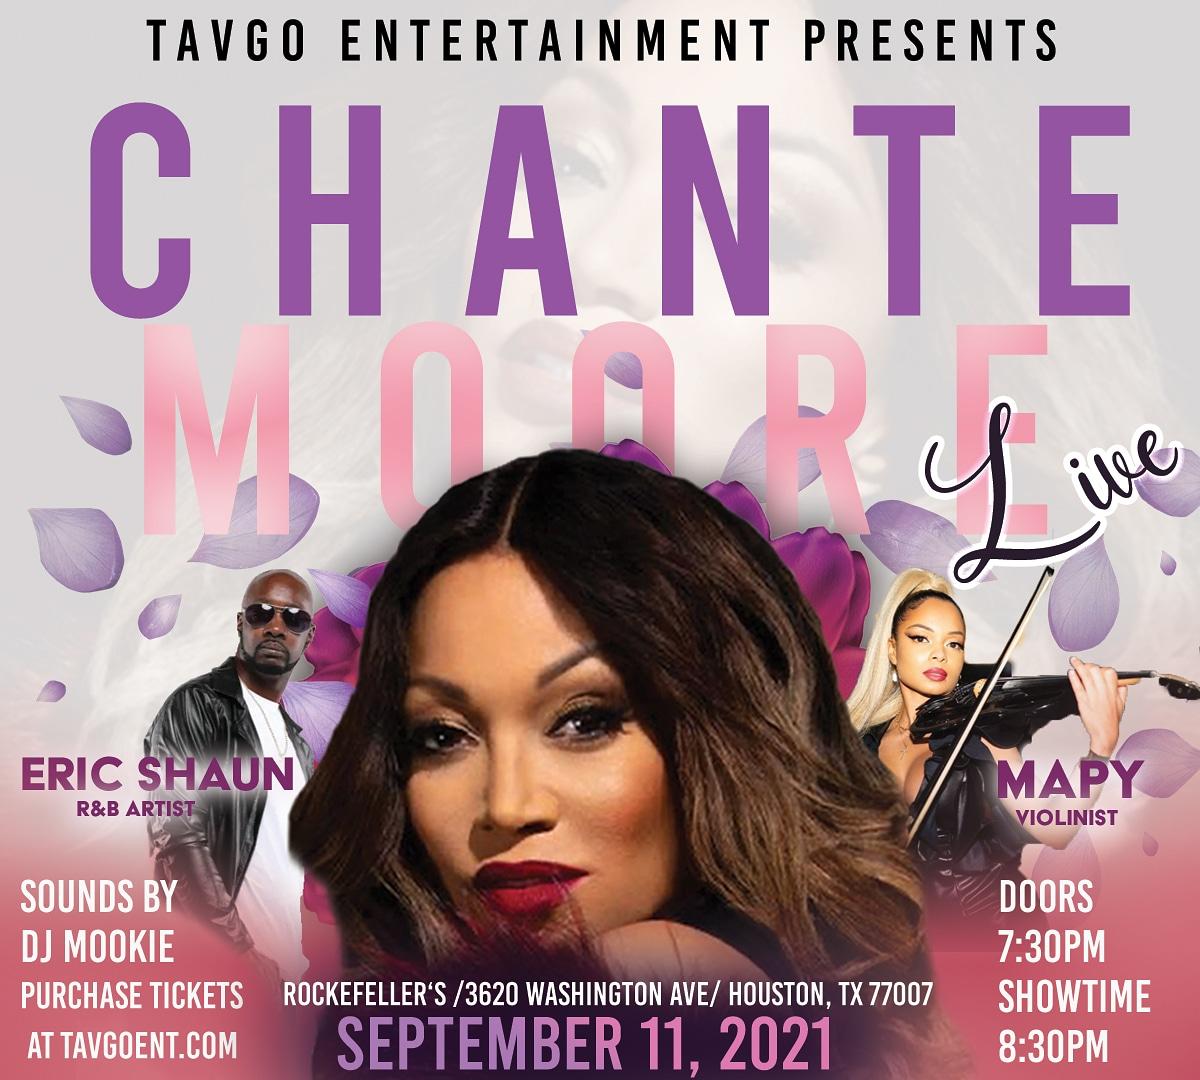 Multi-Award Winning R&B Hummingbird Chante' Moore Live in Concert Powered by TavGo Entertainment